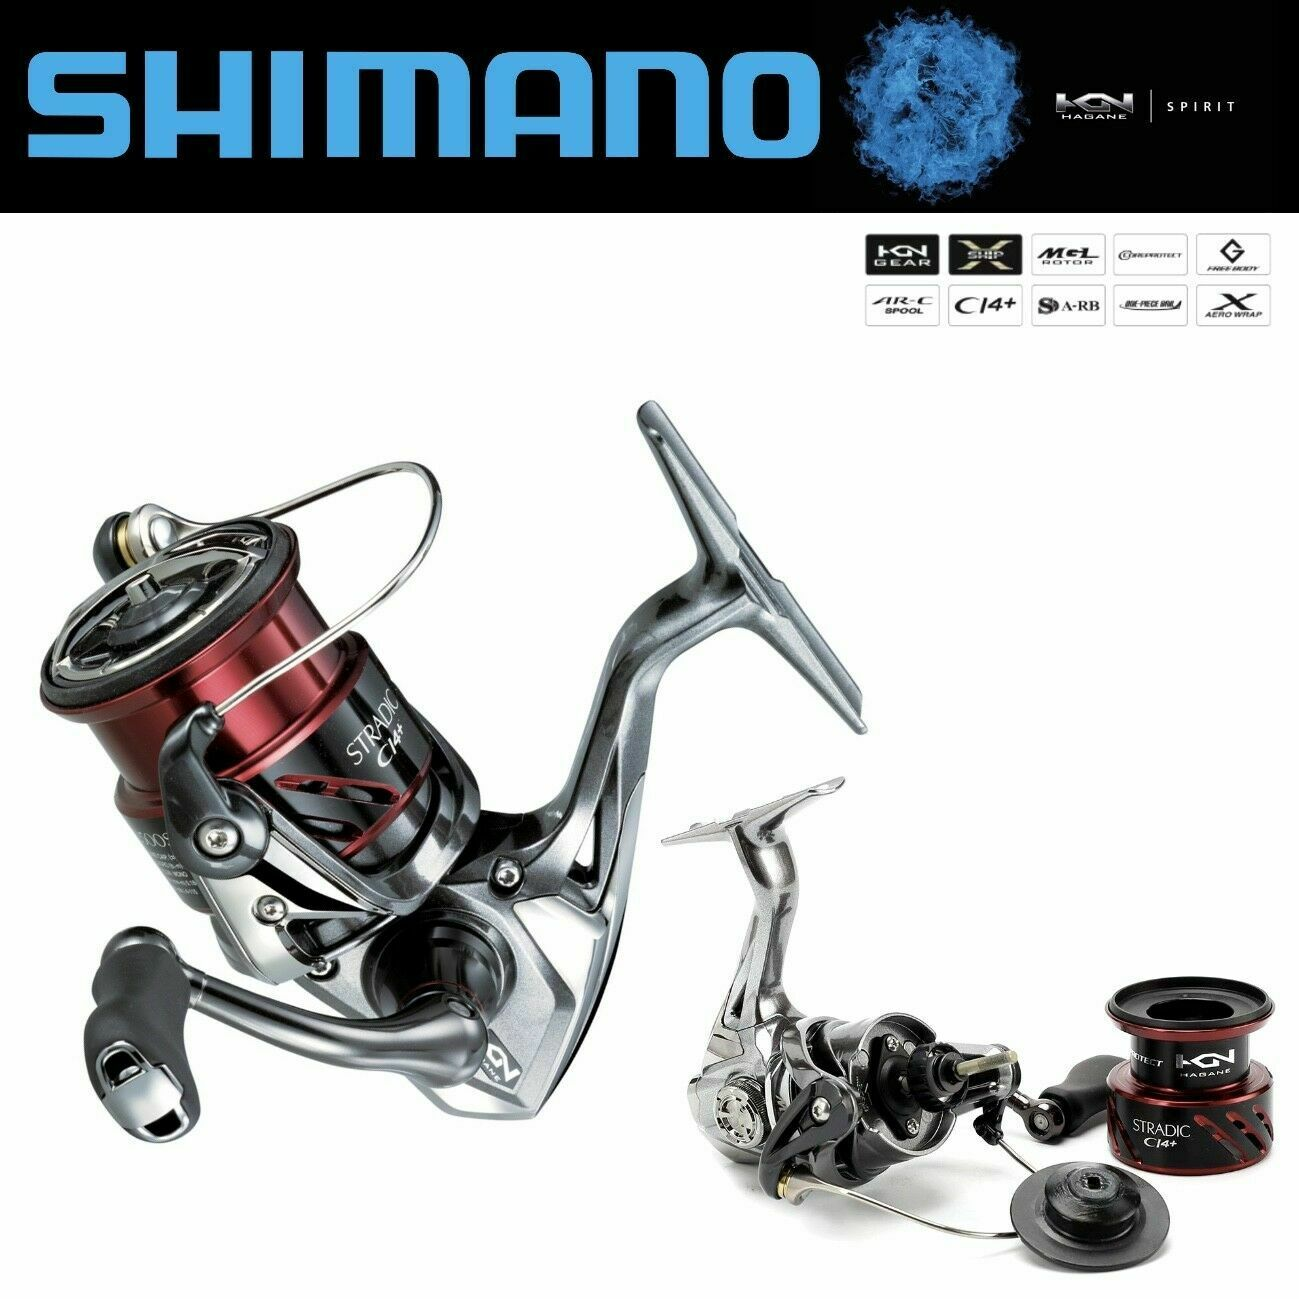 Shimano Spinning Carretes Stradic CI14